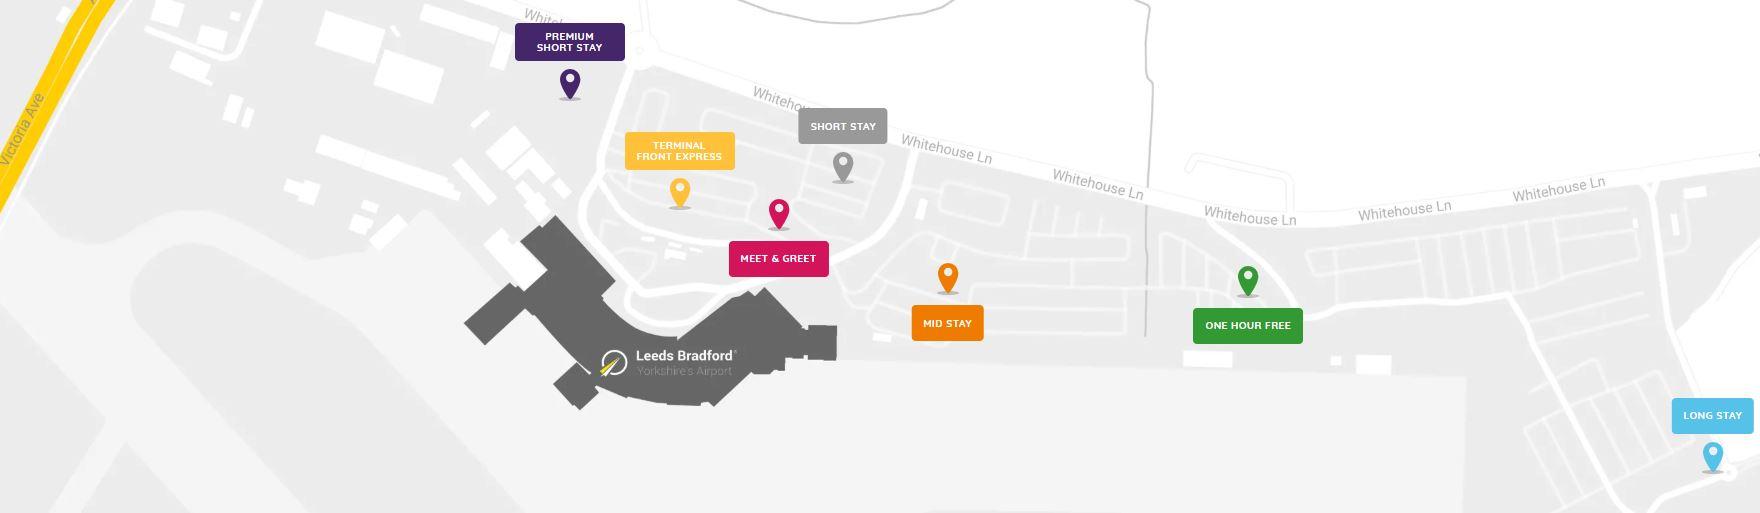 Car park map of Leeds Bradford Airport